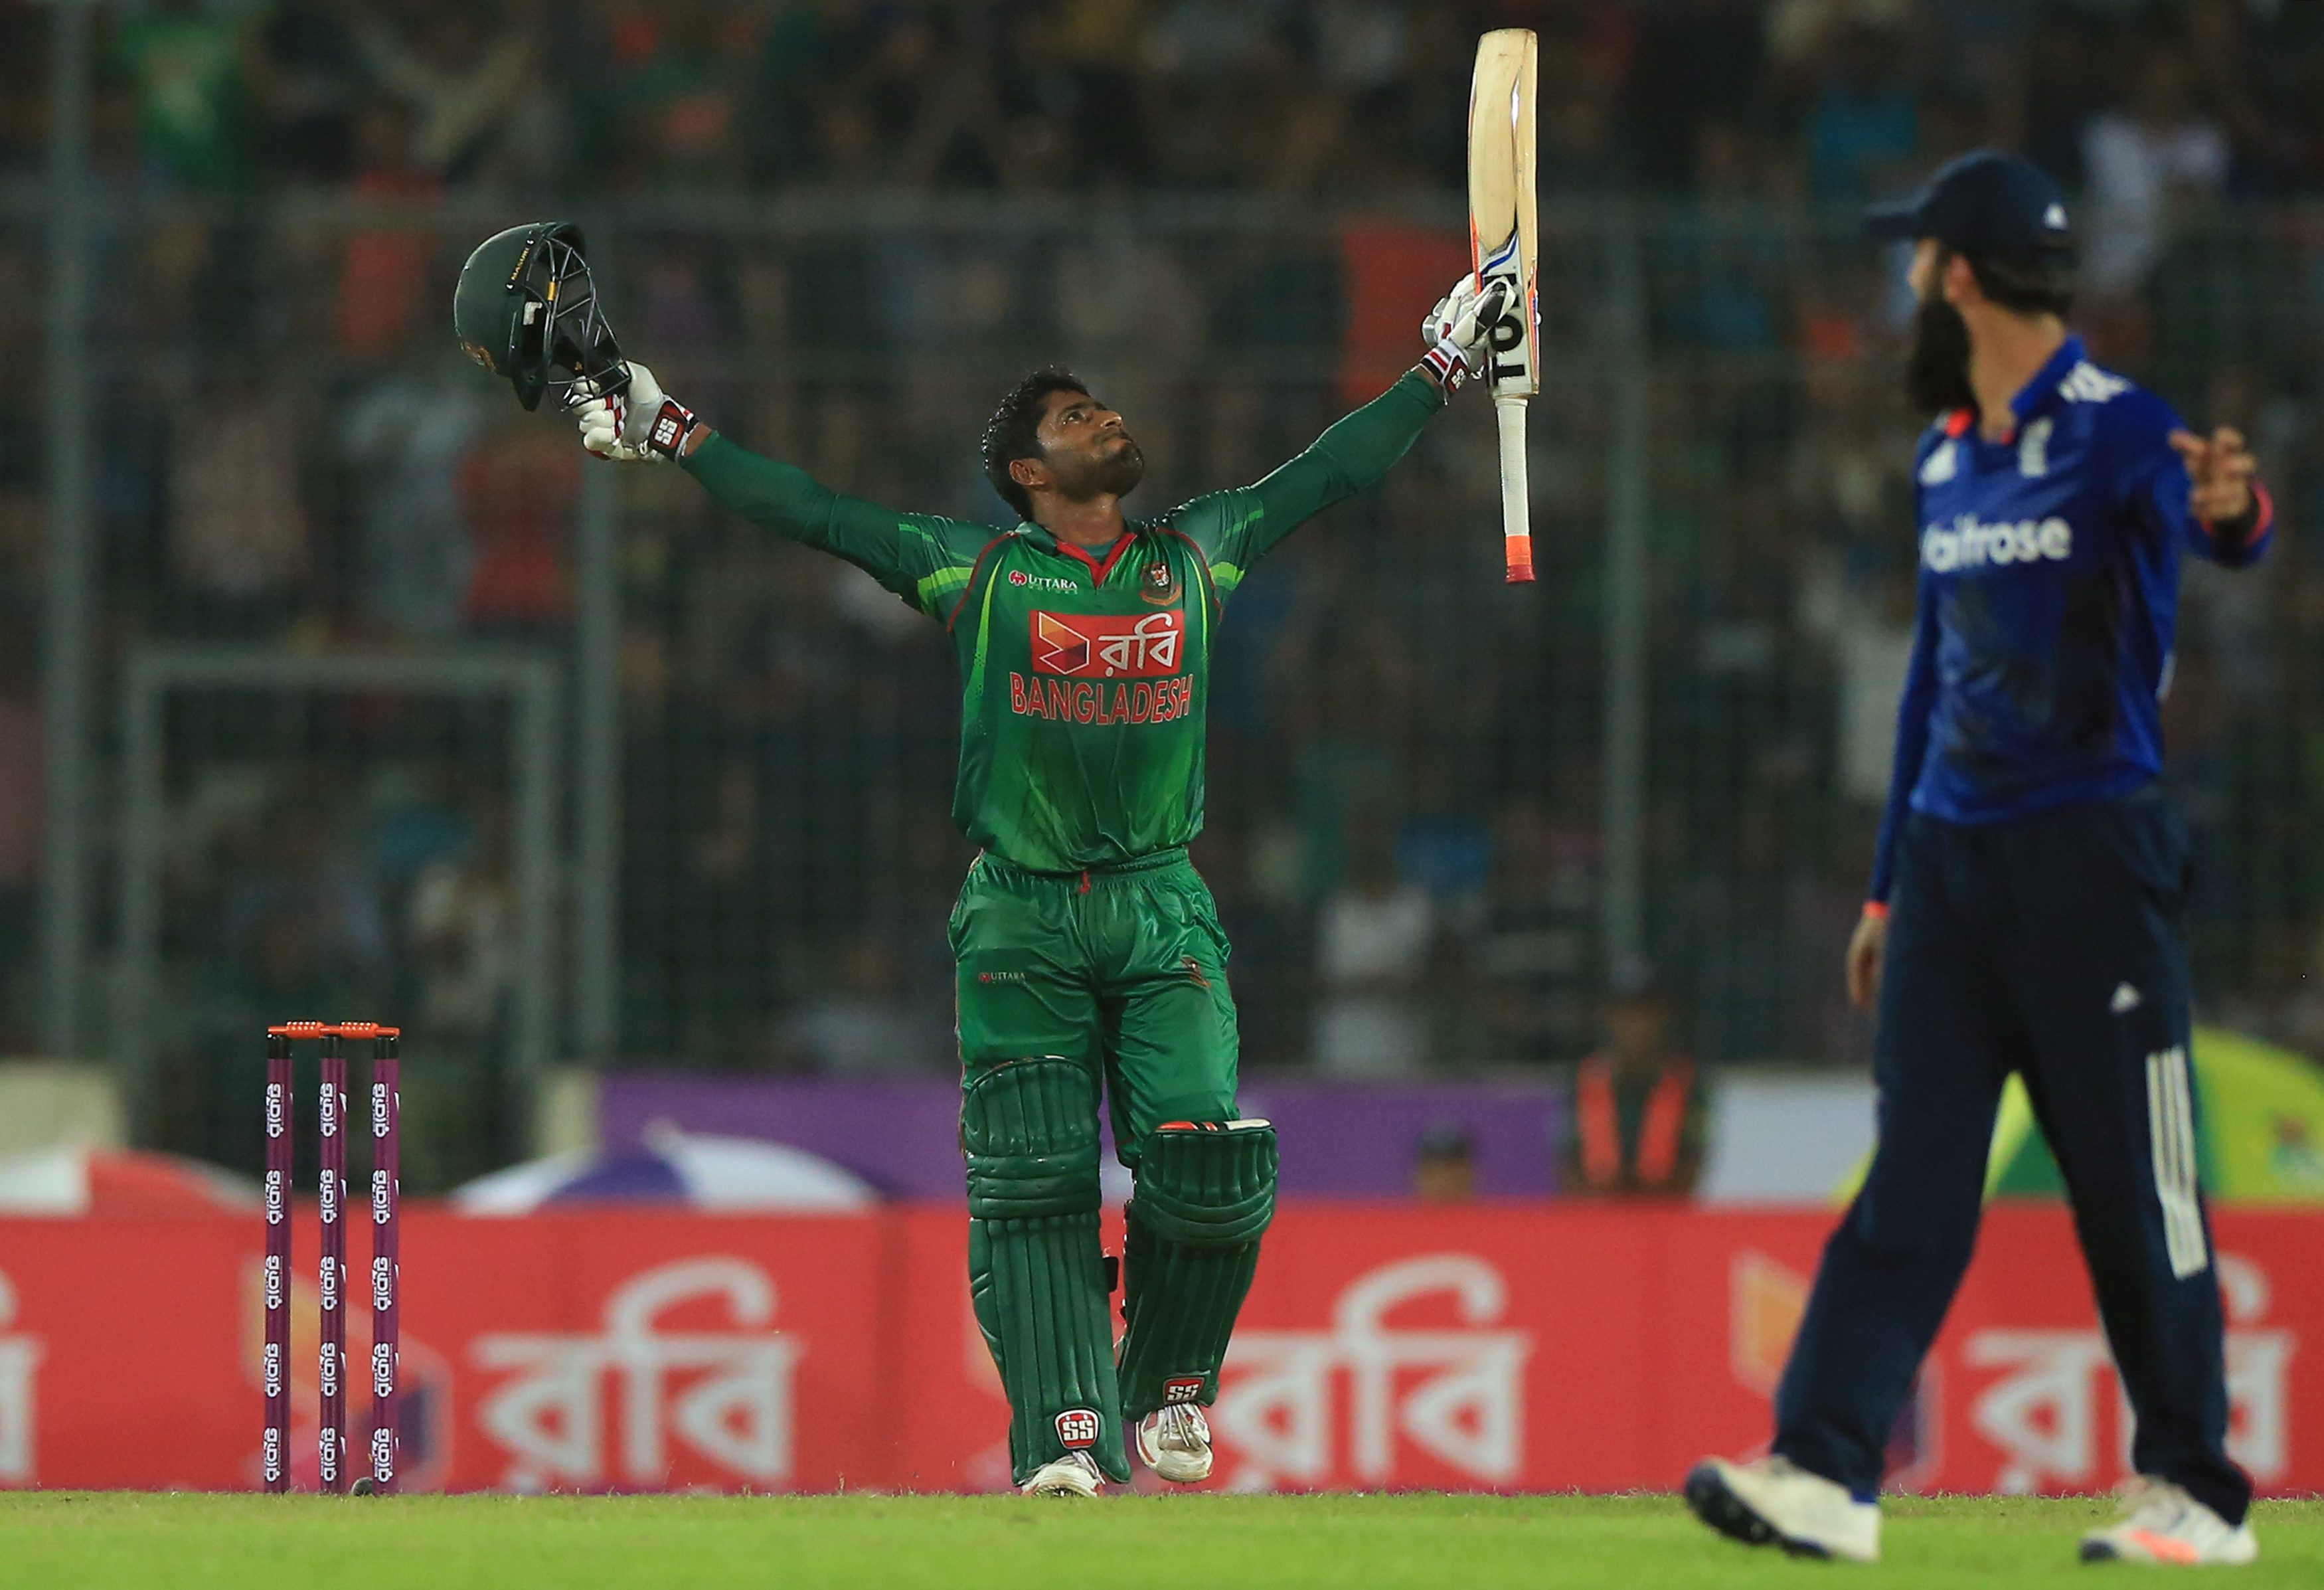 Bangladesh cricket, England cricket, live stream, England World Cup defeat, Bangladesh terrorism, cricket, 2nd ODI, Jake Ball